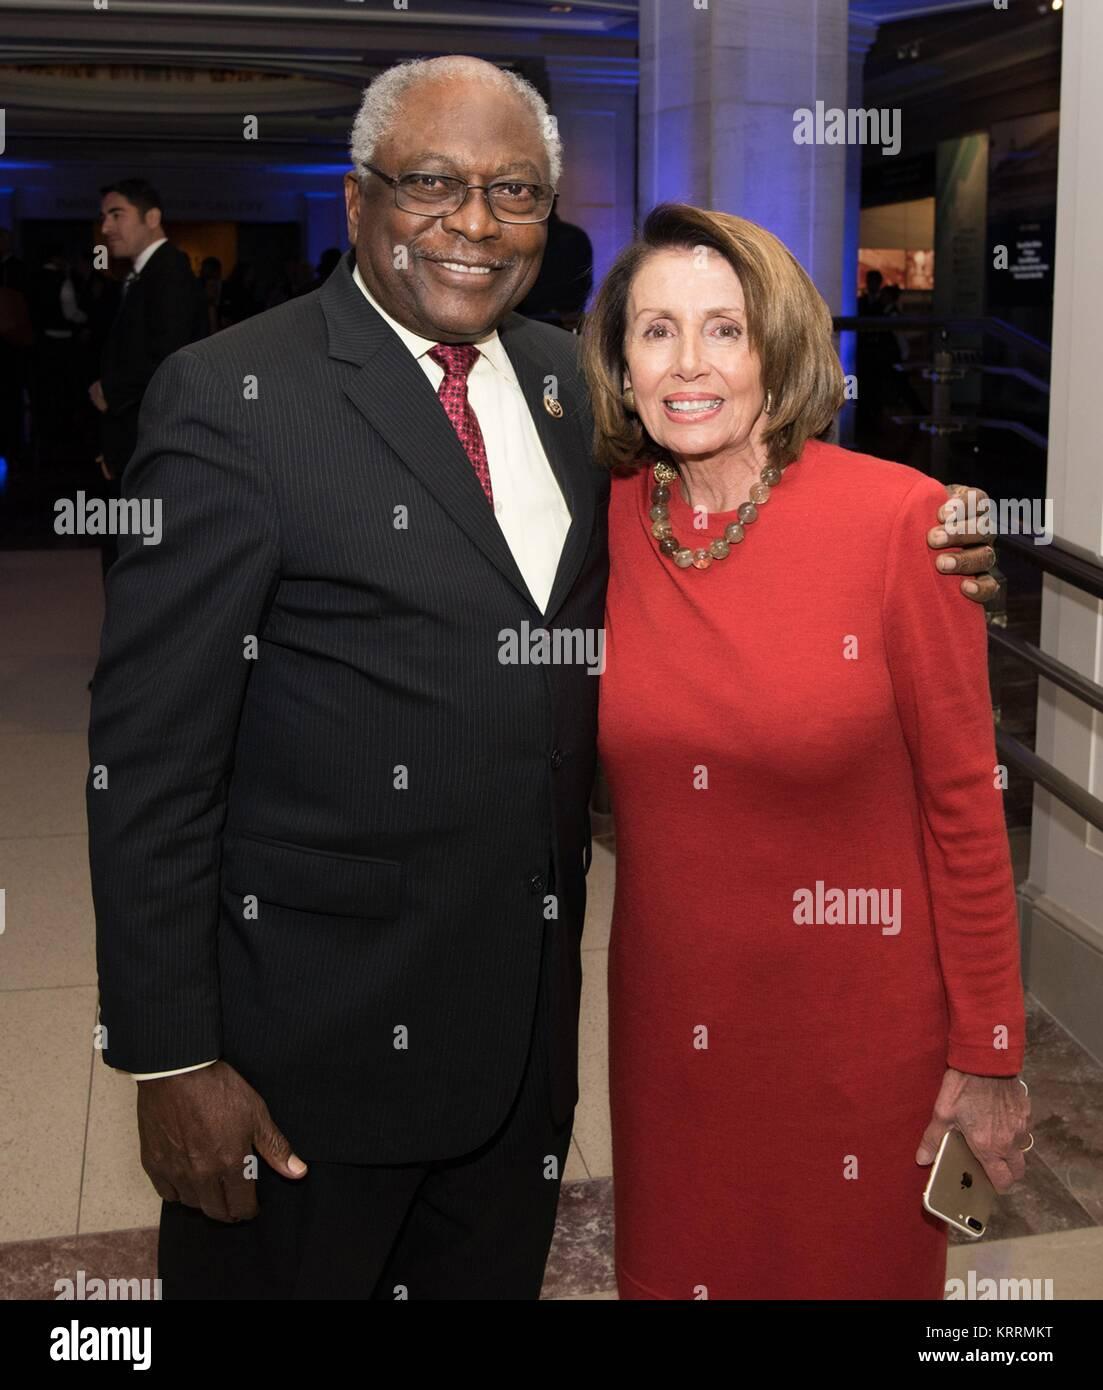 U.S. South Carolina Representative James Clyburn (left) and U.S ...